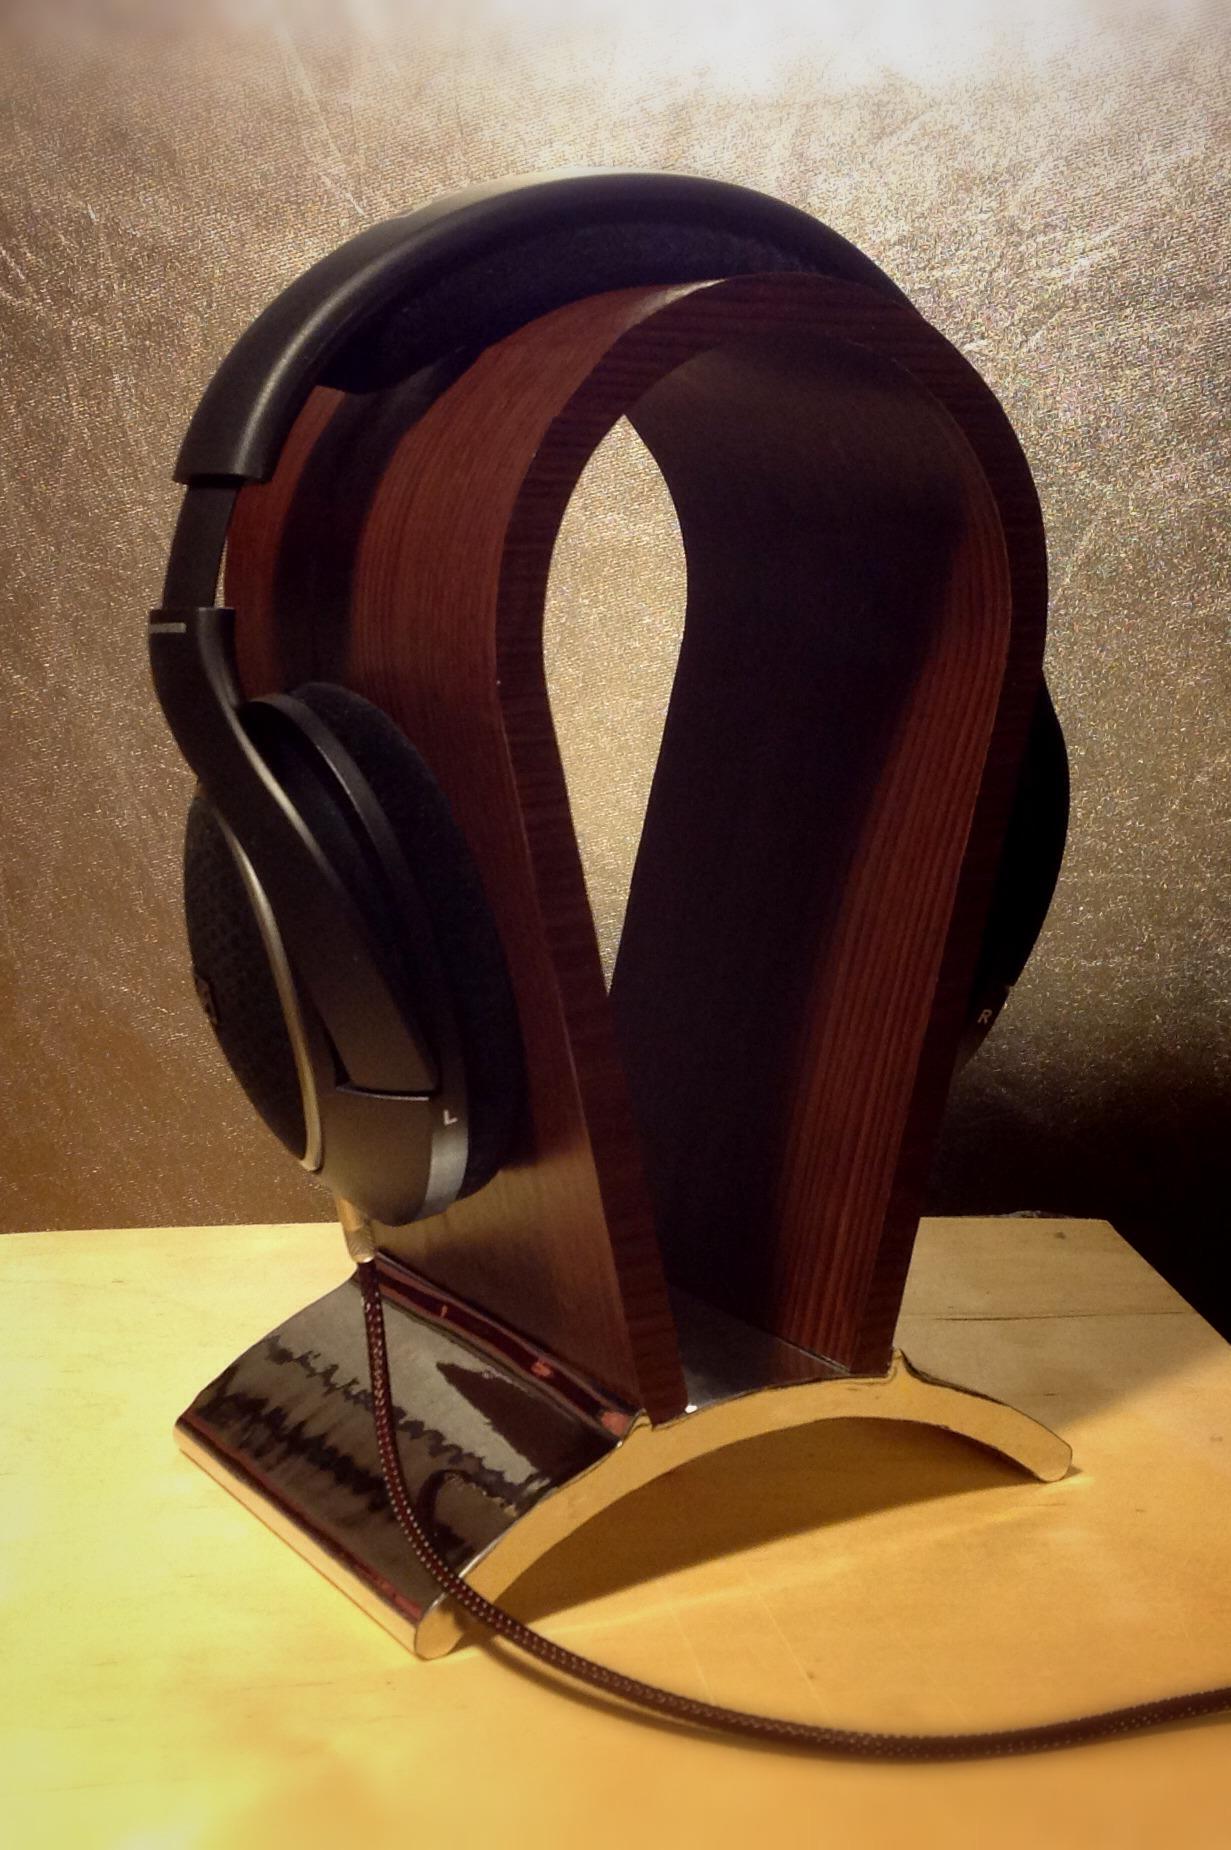 Headphone Stand Designs : Headphone standautodesk online gallery